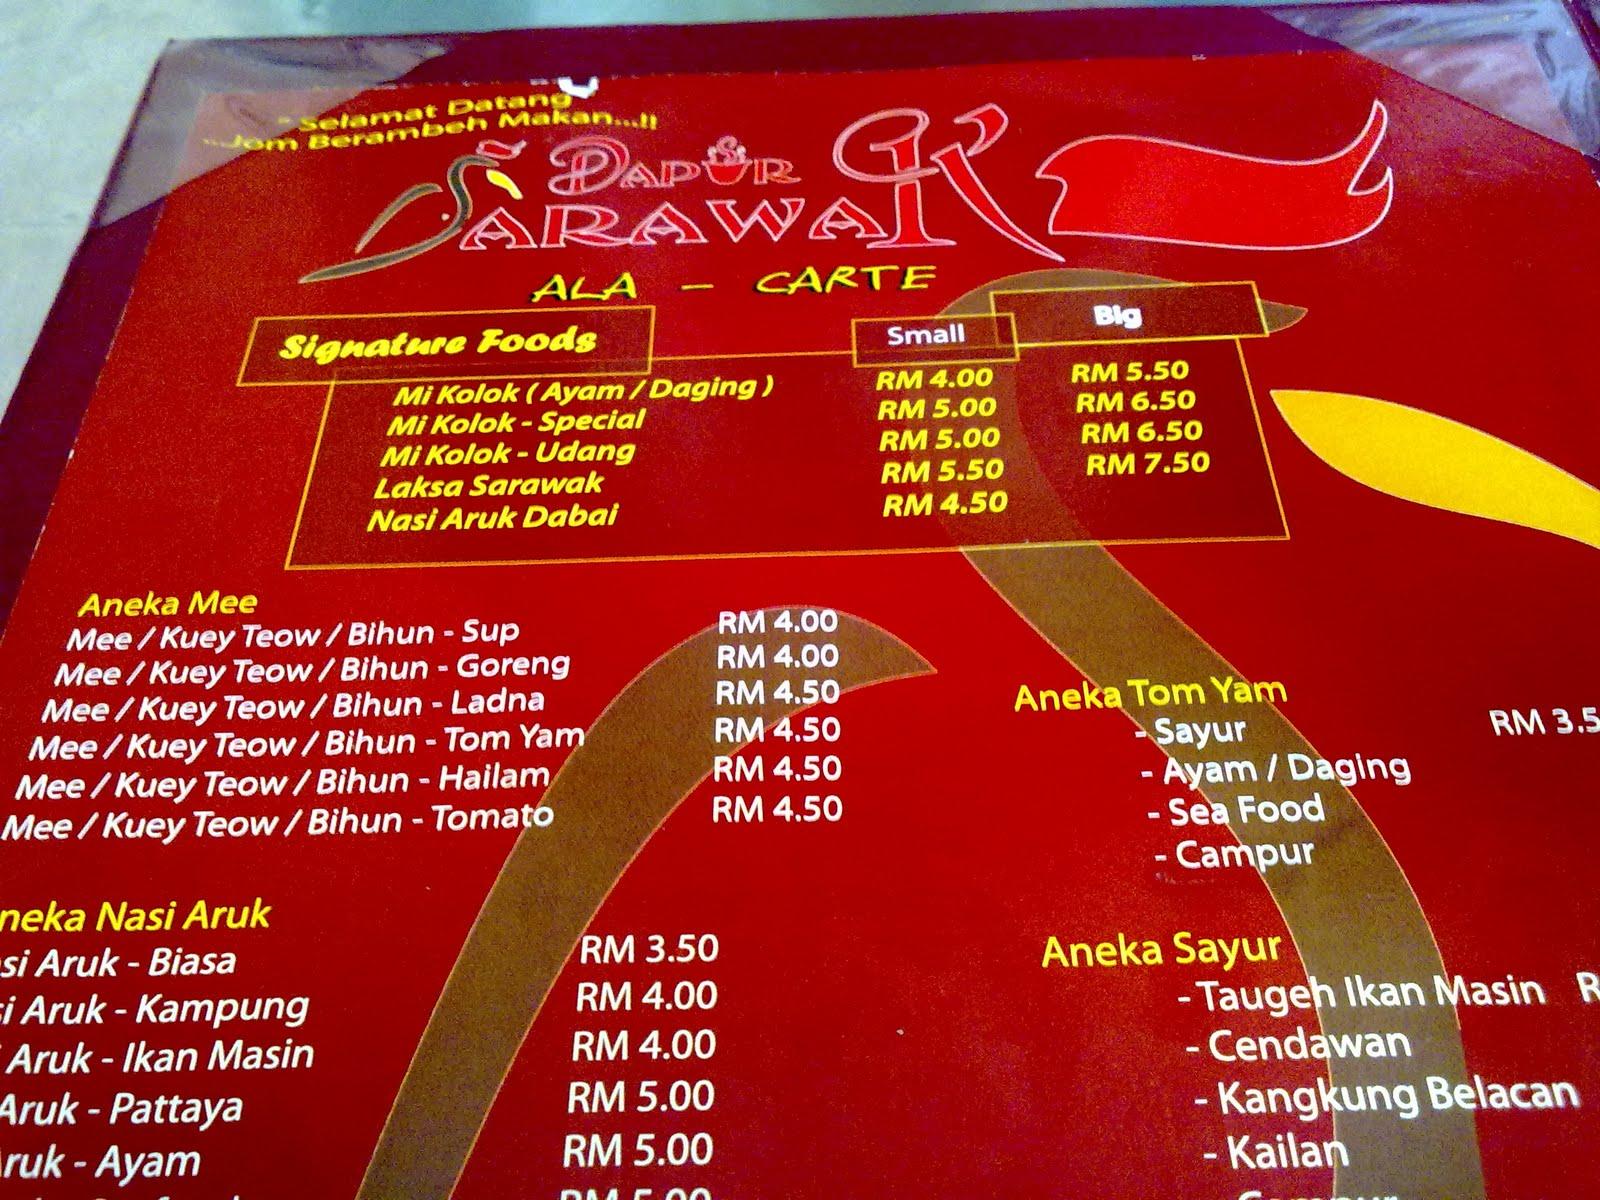 Antara Yang Special Or Signature Foods Ialah Laksa Sarawak Mee Kolok Dan Nasi Aruk Dabai